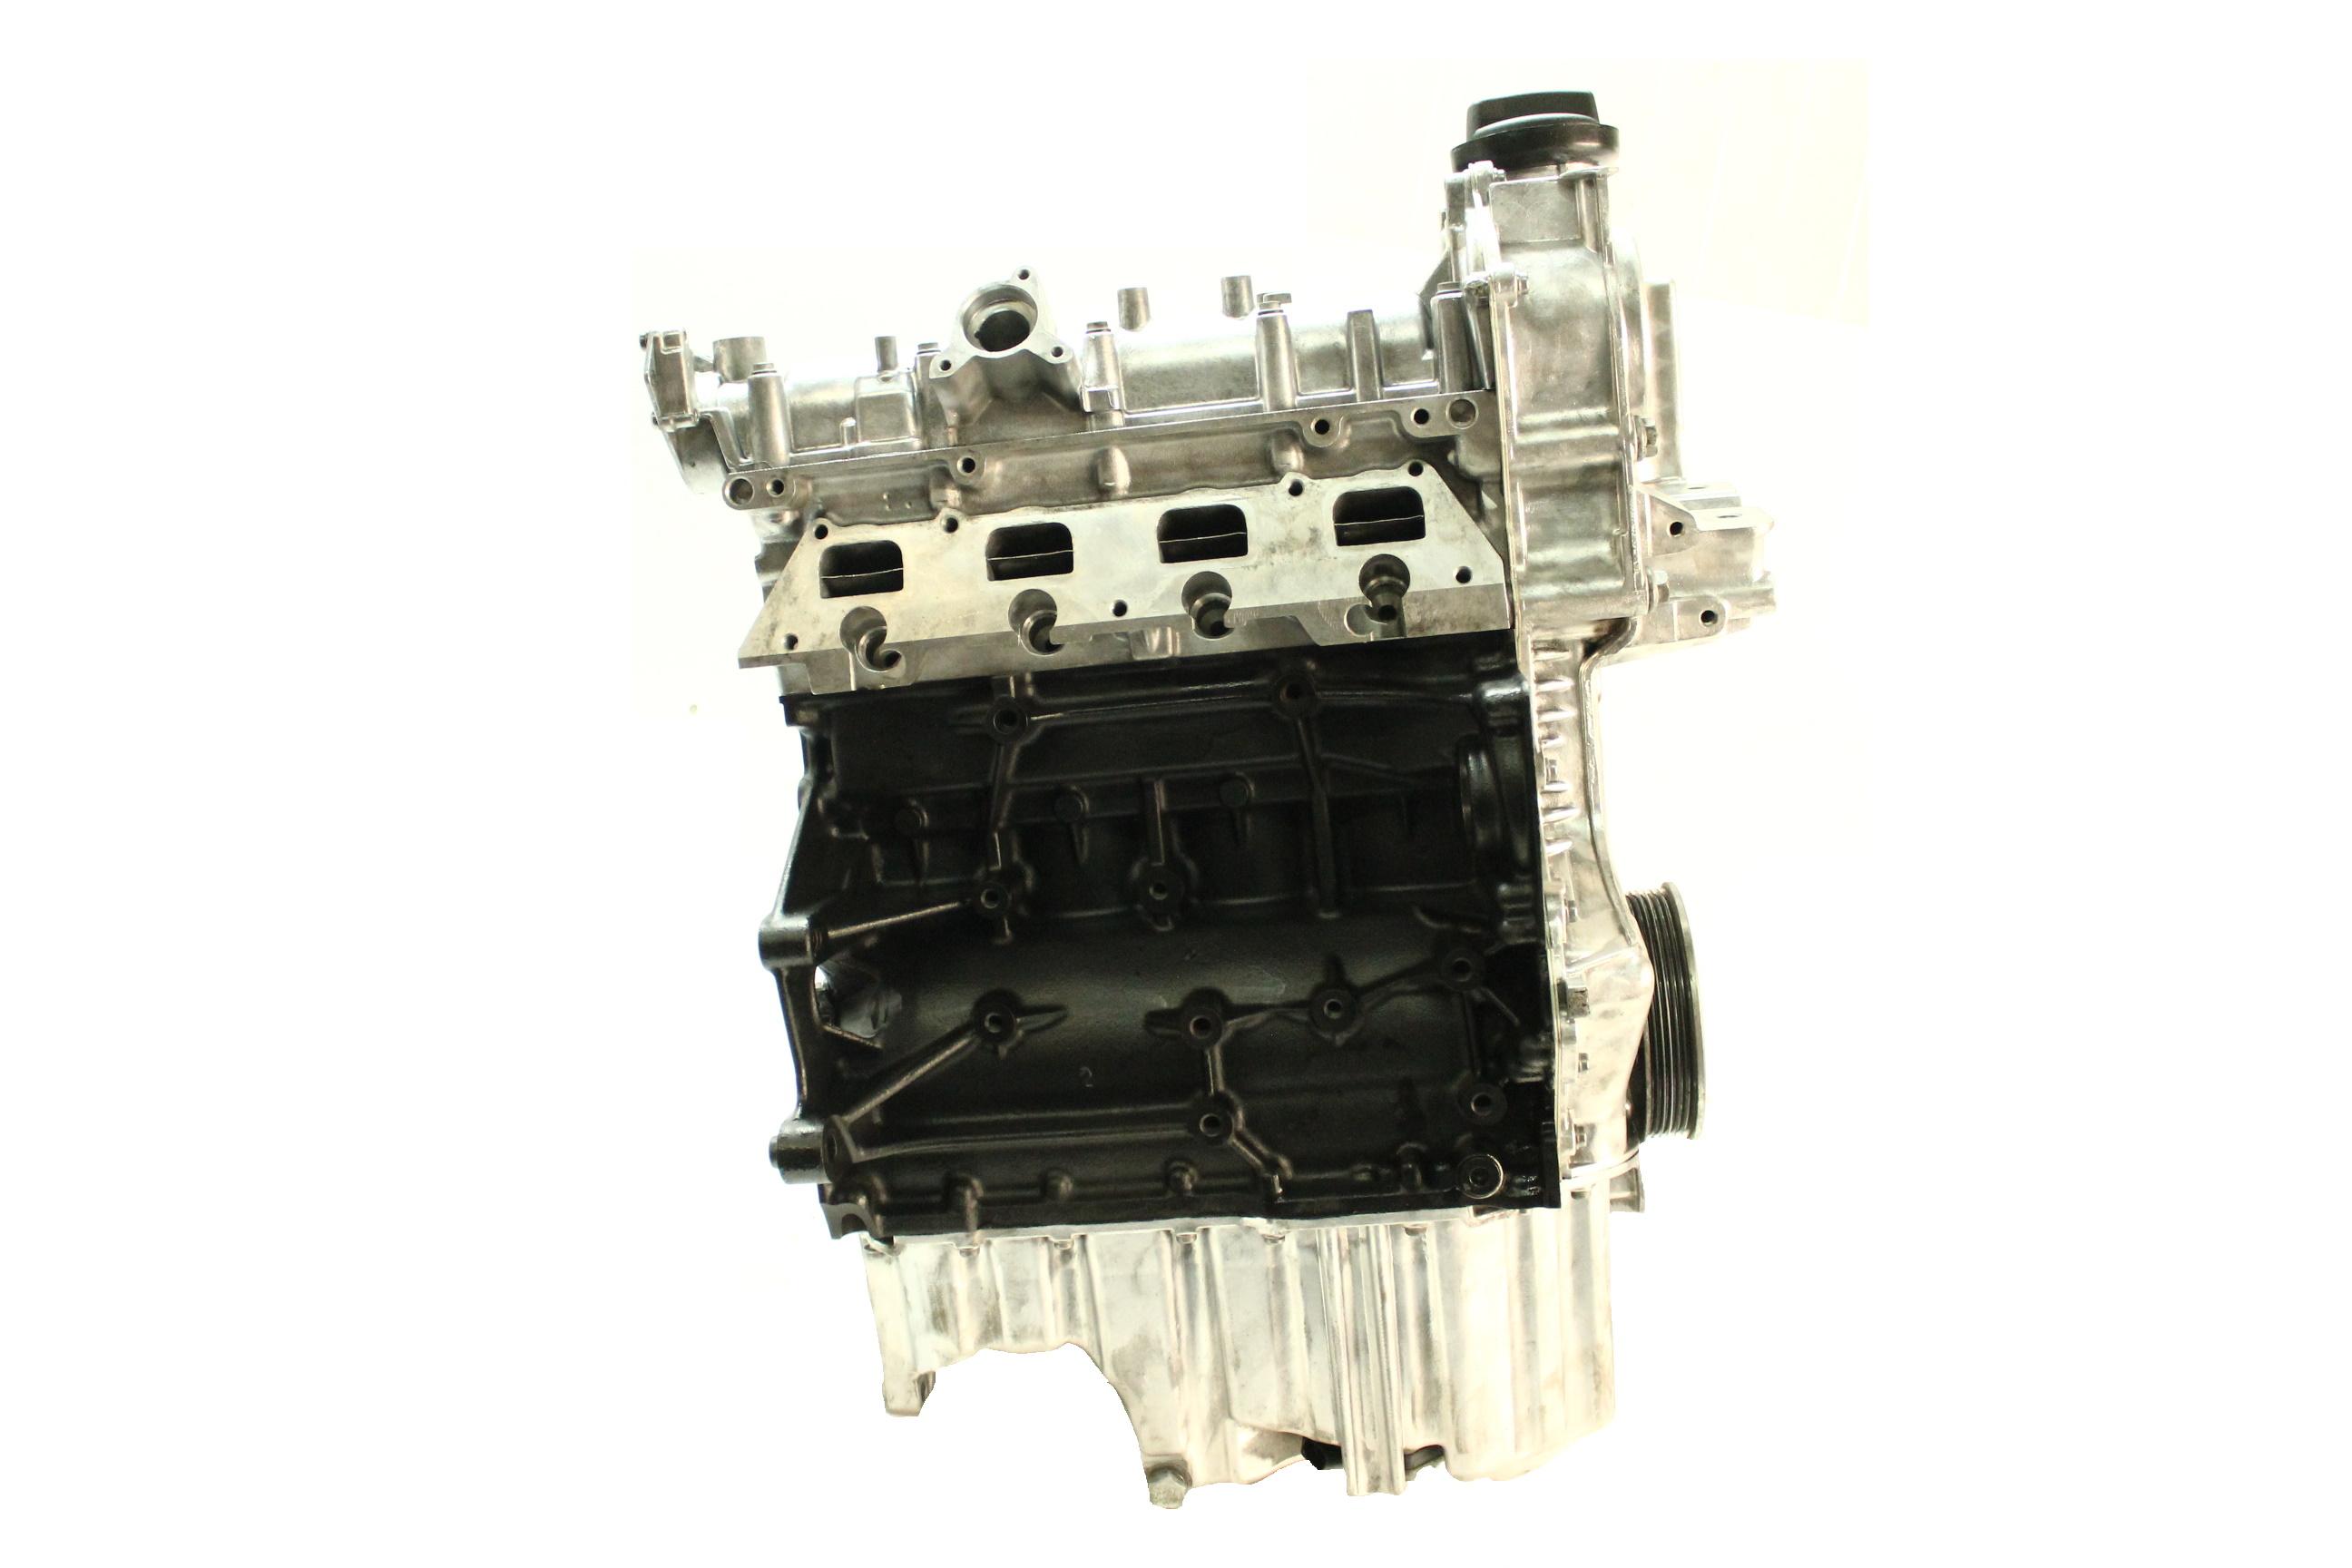 Motor Überholt 2008 VW Jetta 1,4 TSI BLG Kolben Kettensatz Dichtung NEU